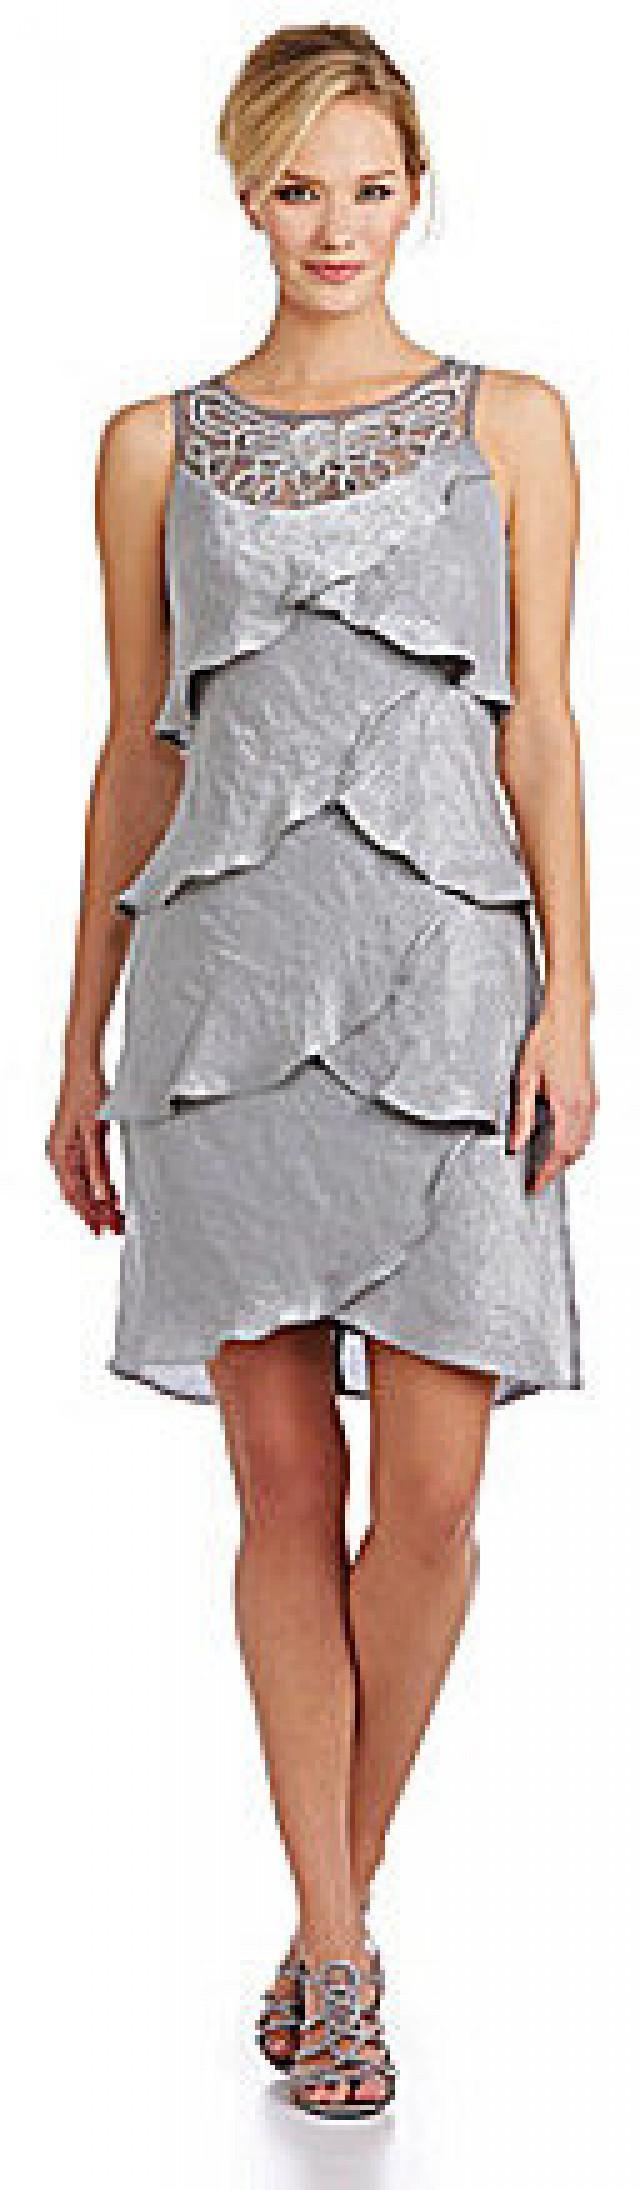 Sl sl fashion dresses - Sl Sl Fashion Dresses 4